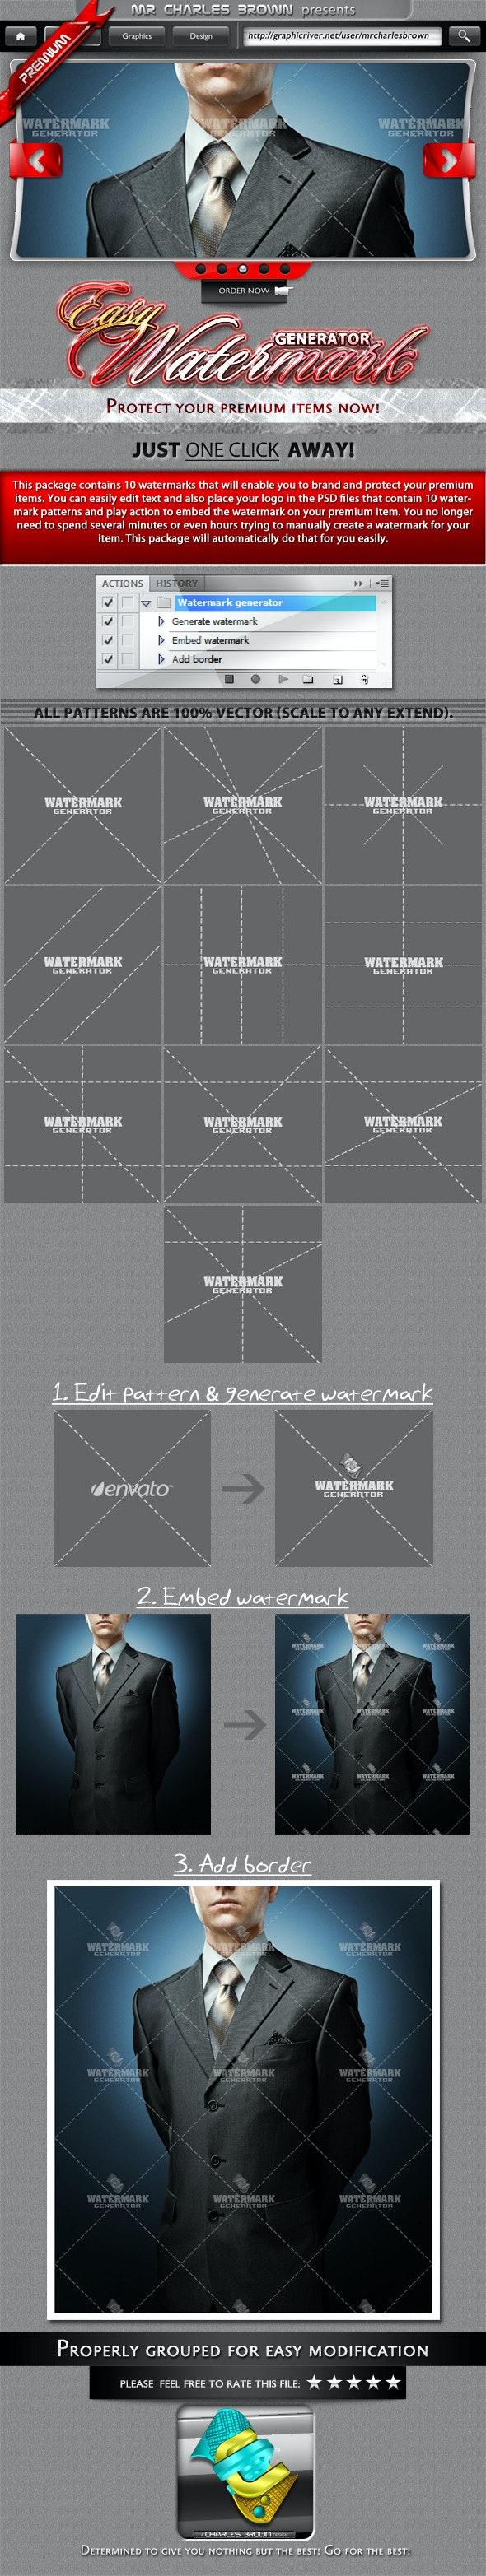 Easy Watermark Generator - Photoshop Add-ons